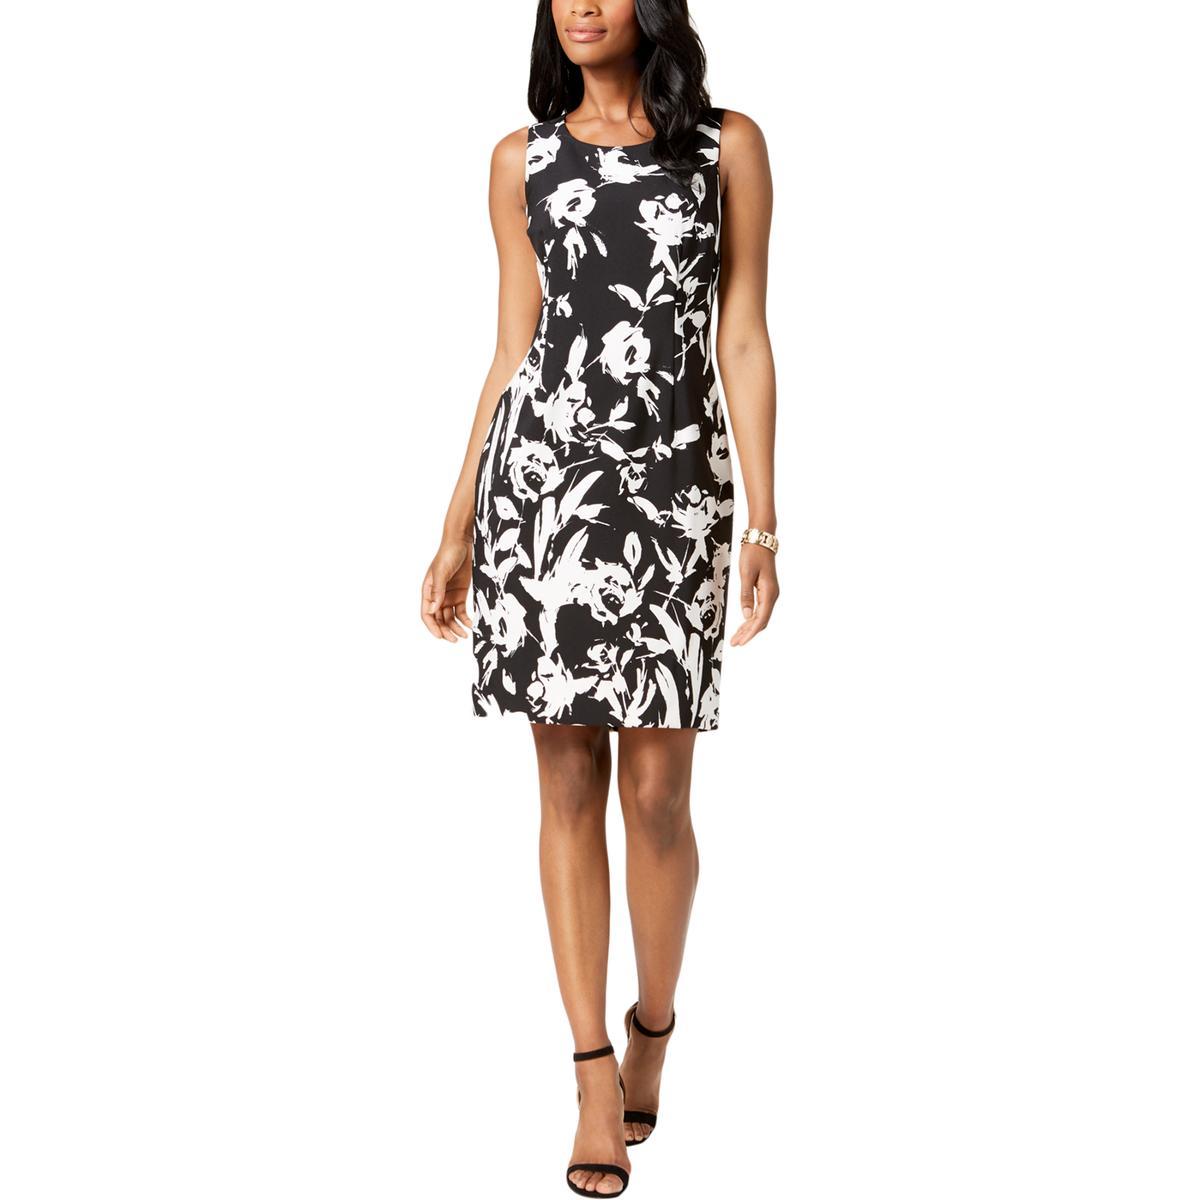 01787dacc8a Details about Kasper Womens Floral Print Colorblock Wear to Work Dress Plus  BHFO 9234